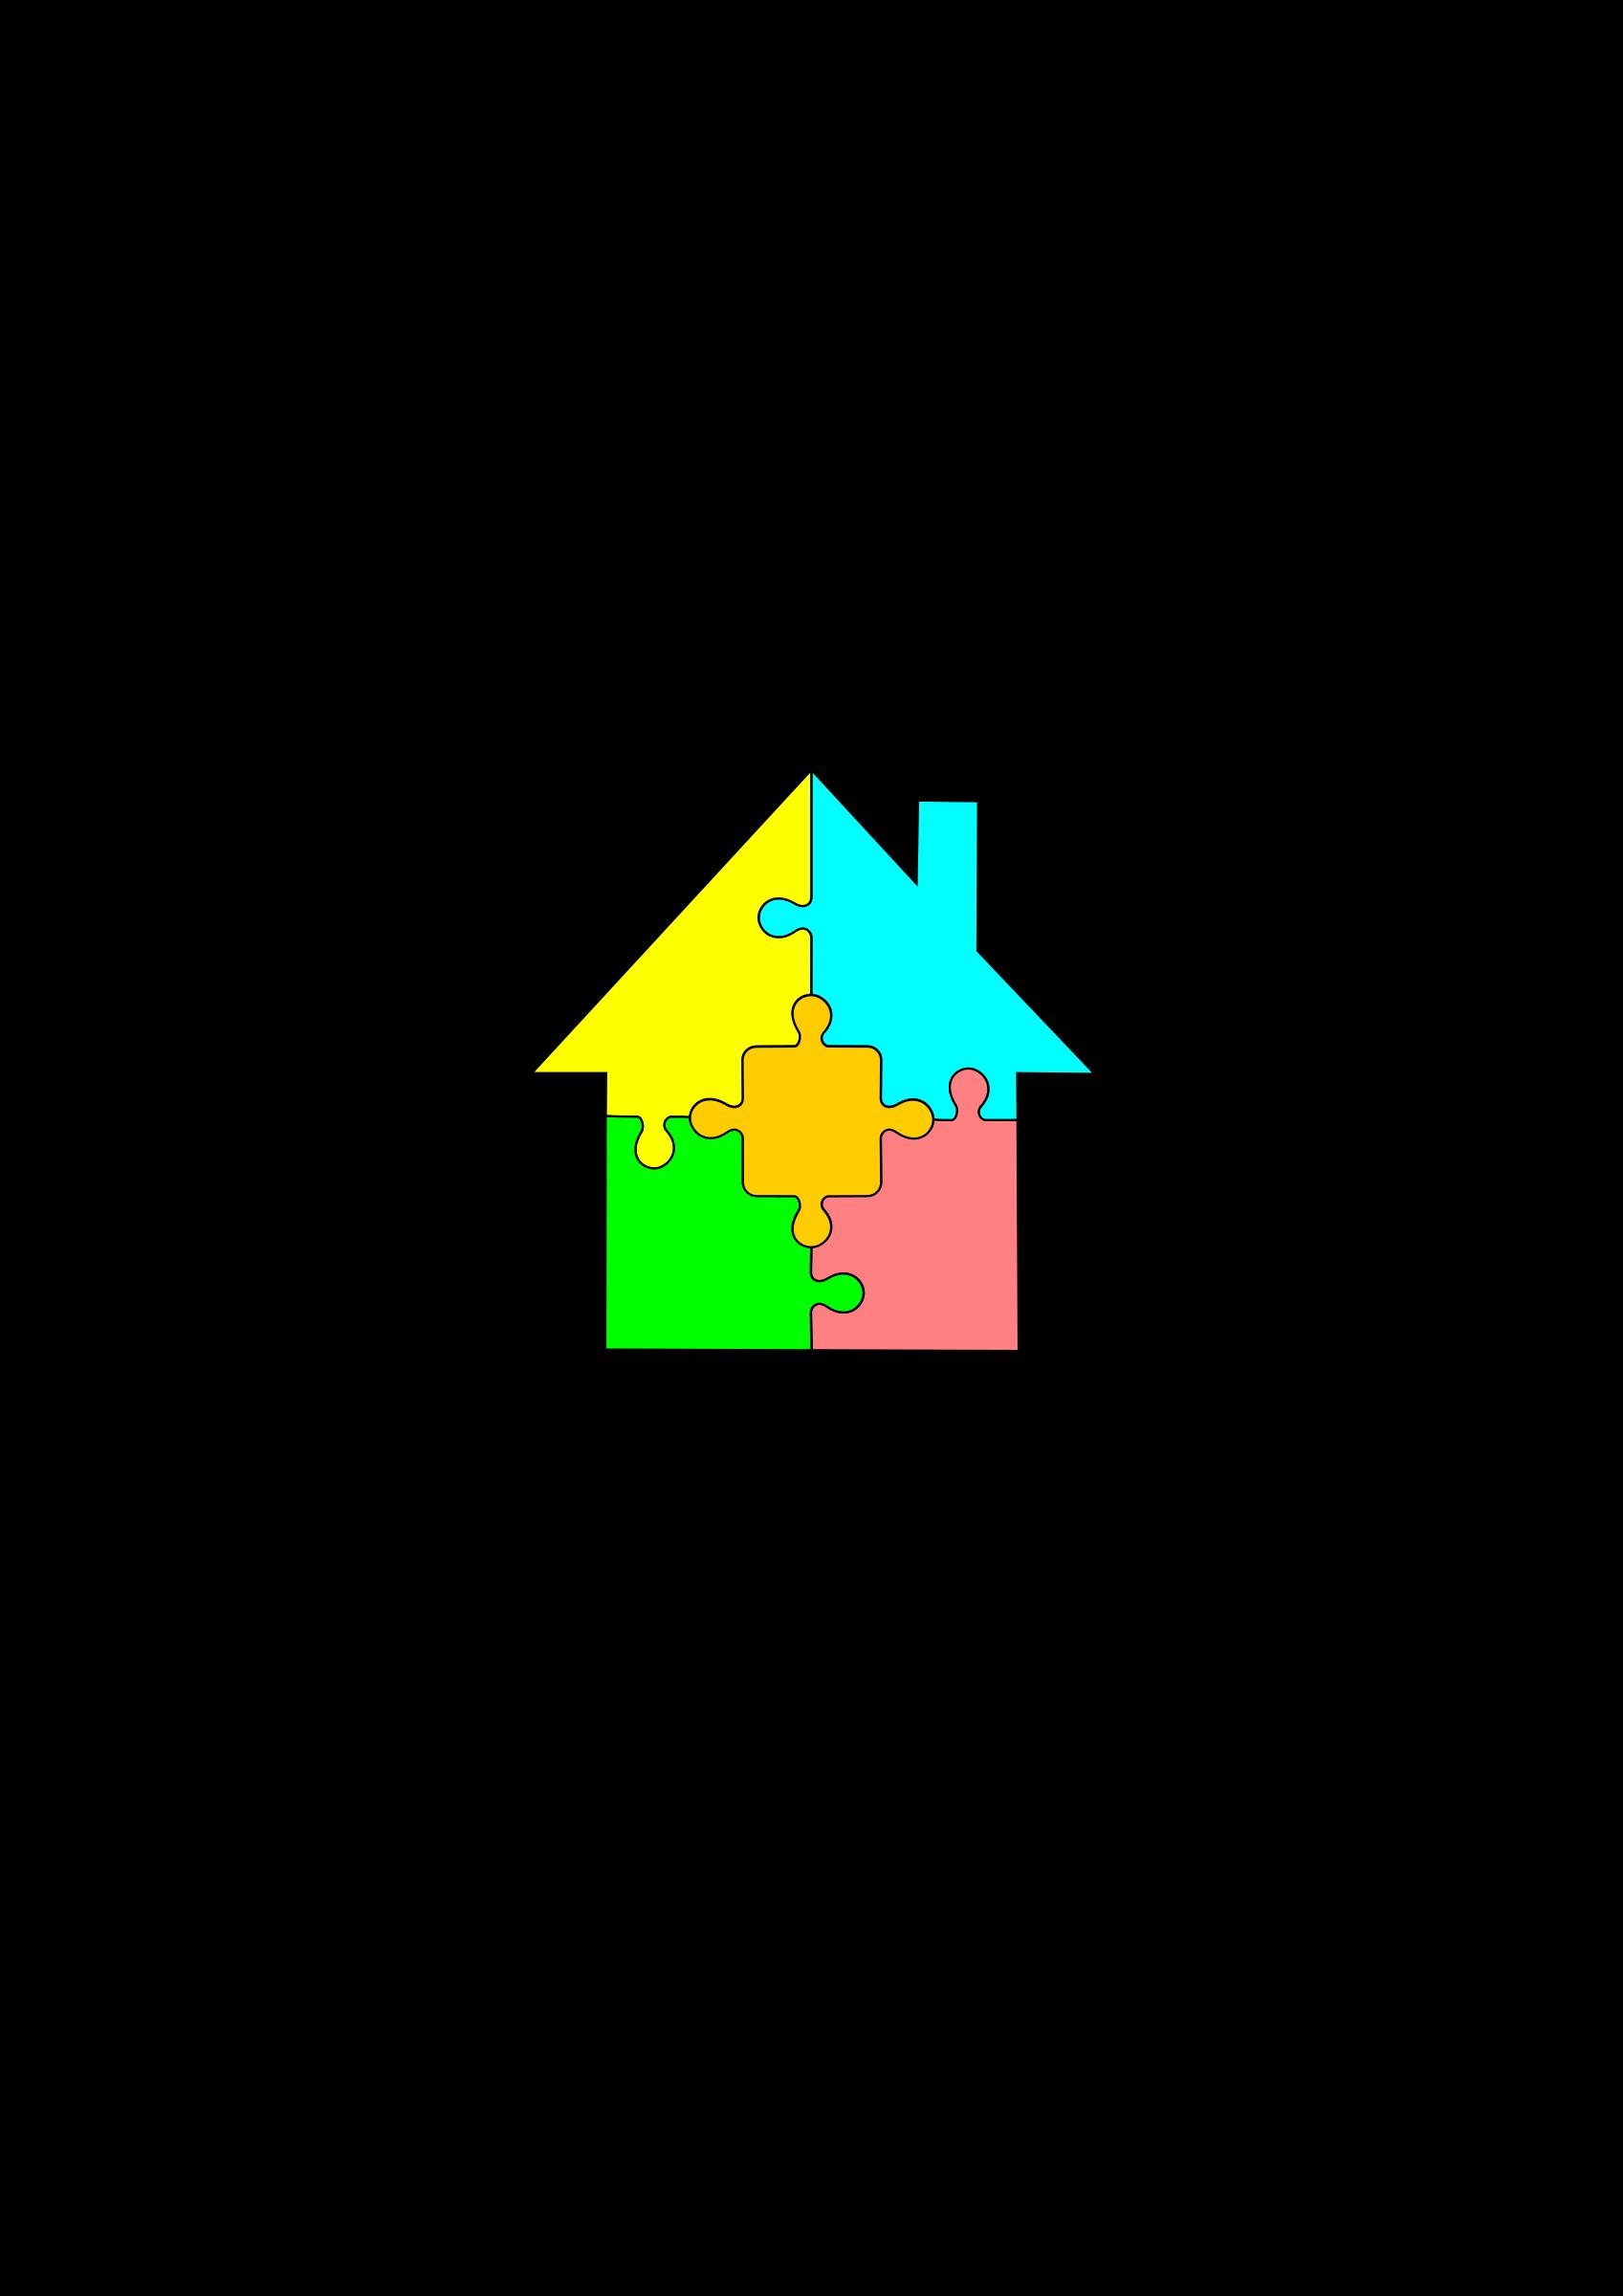 Puzzle clipart house. Big image png